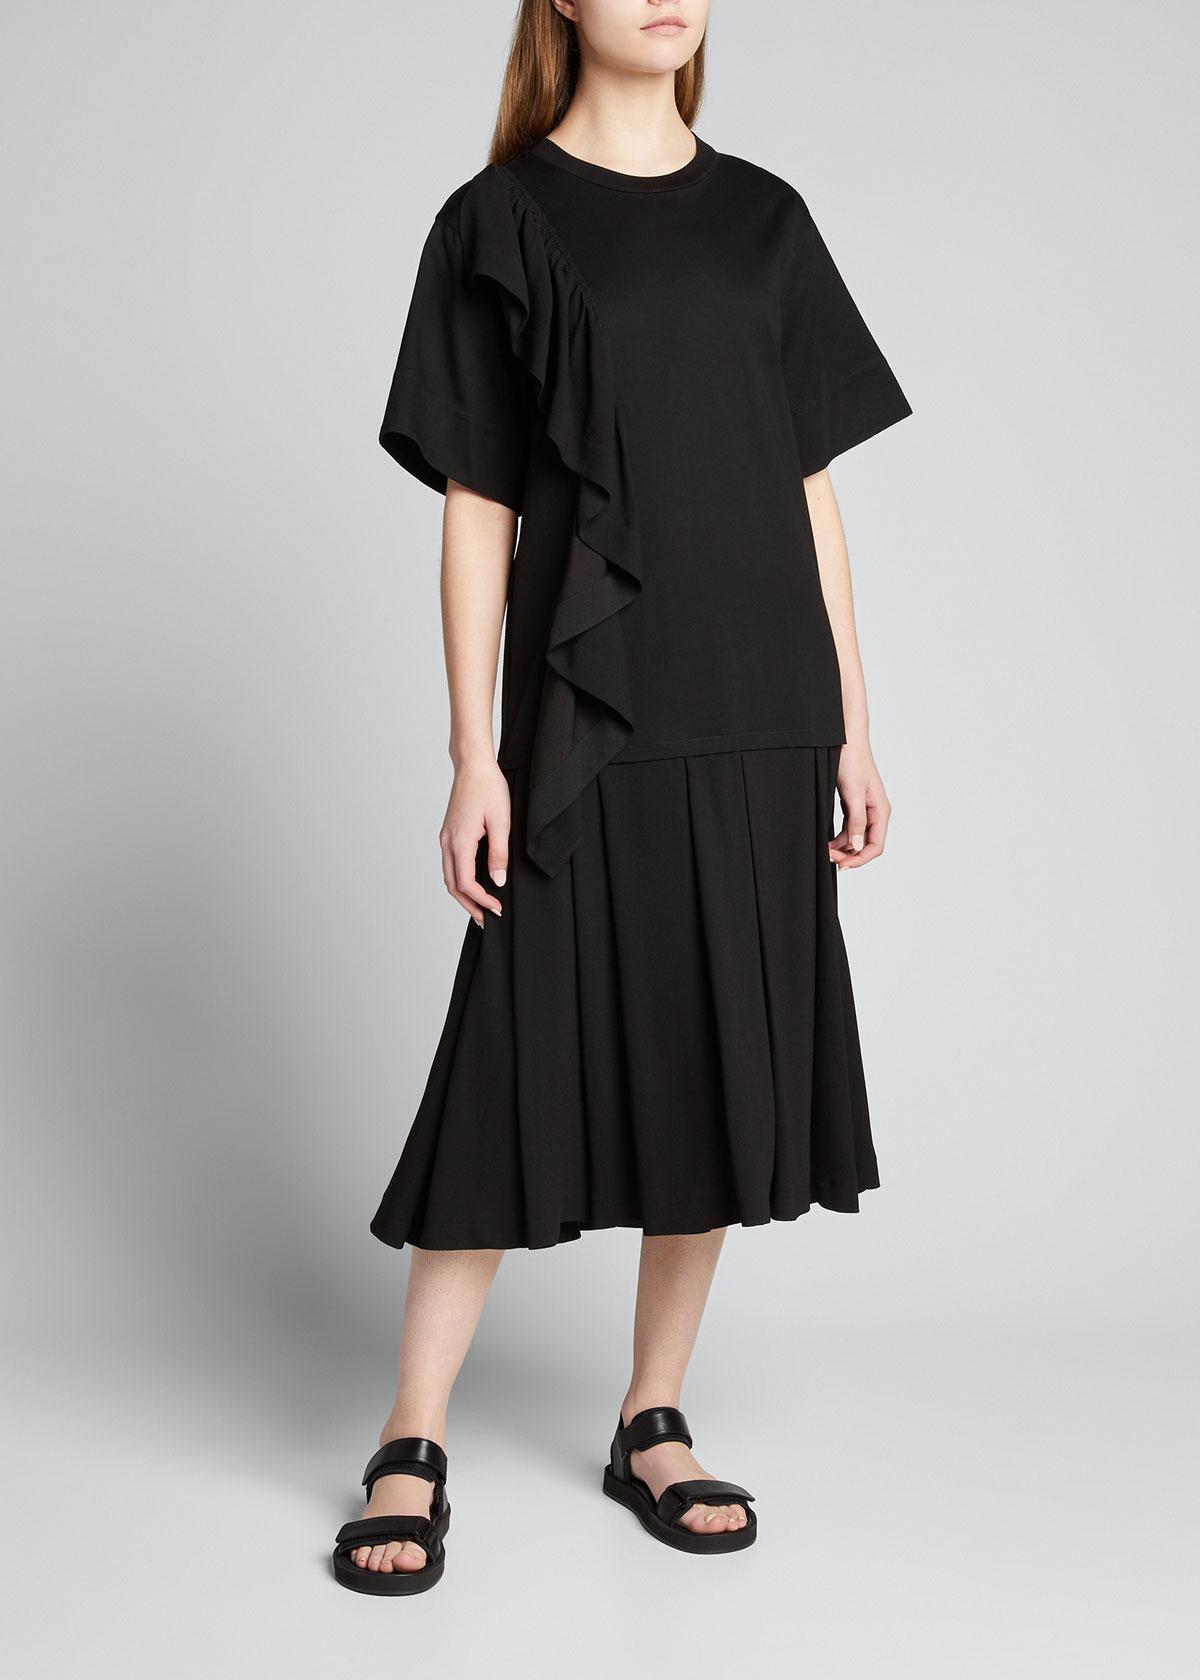 3.1 Phillip Lim RUFFLE COMBO PLEATED T-SHIRT DRESS